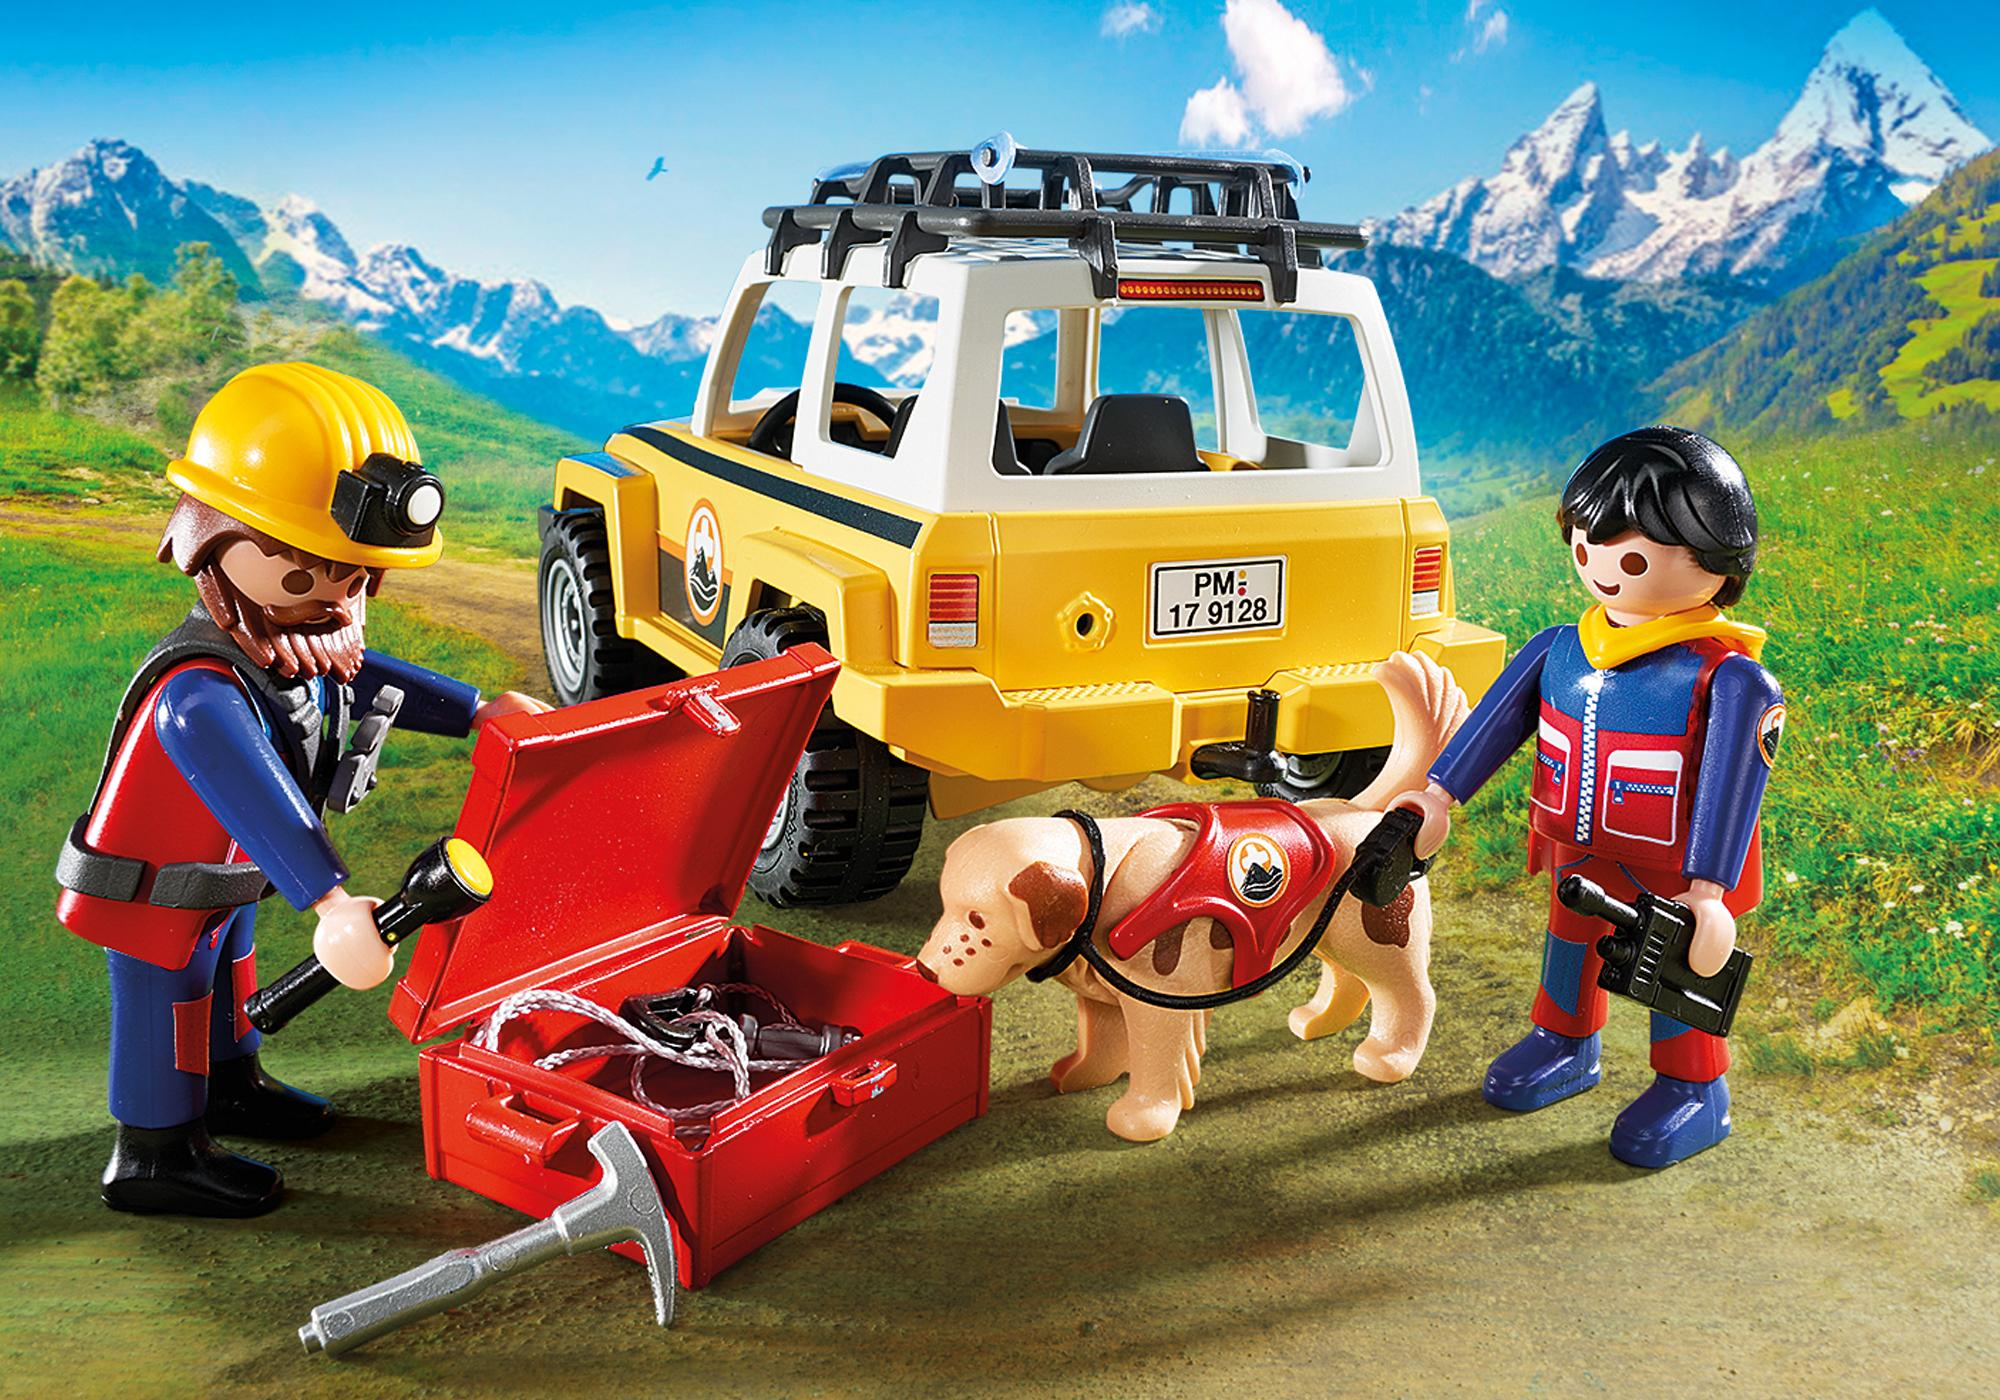 http://media.playmobil.com/i/playmobil/9128_product_extra1/Mountain Rescue Truck